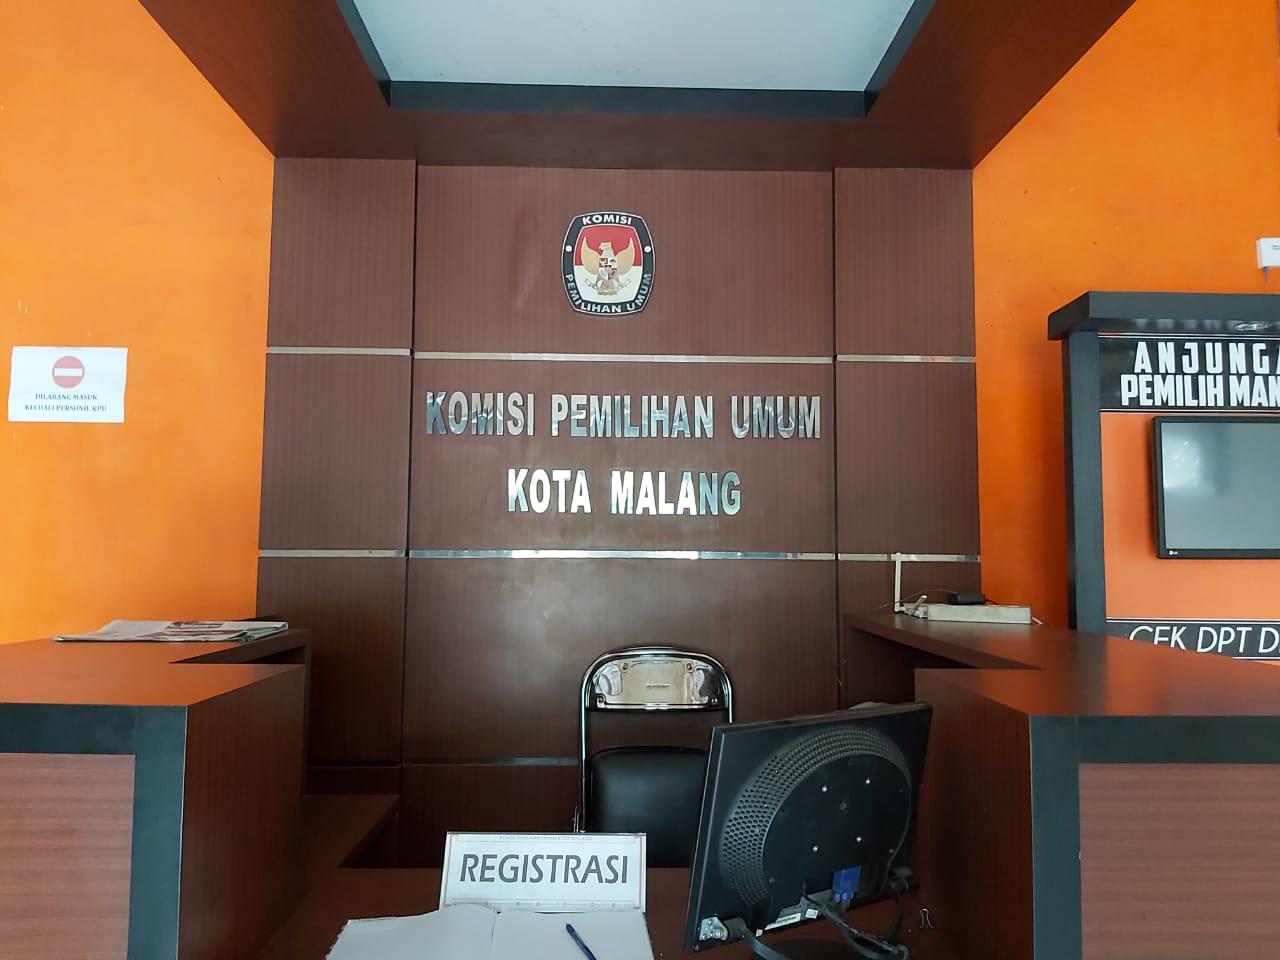 KPU Kota Malang